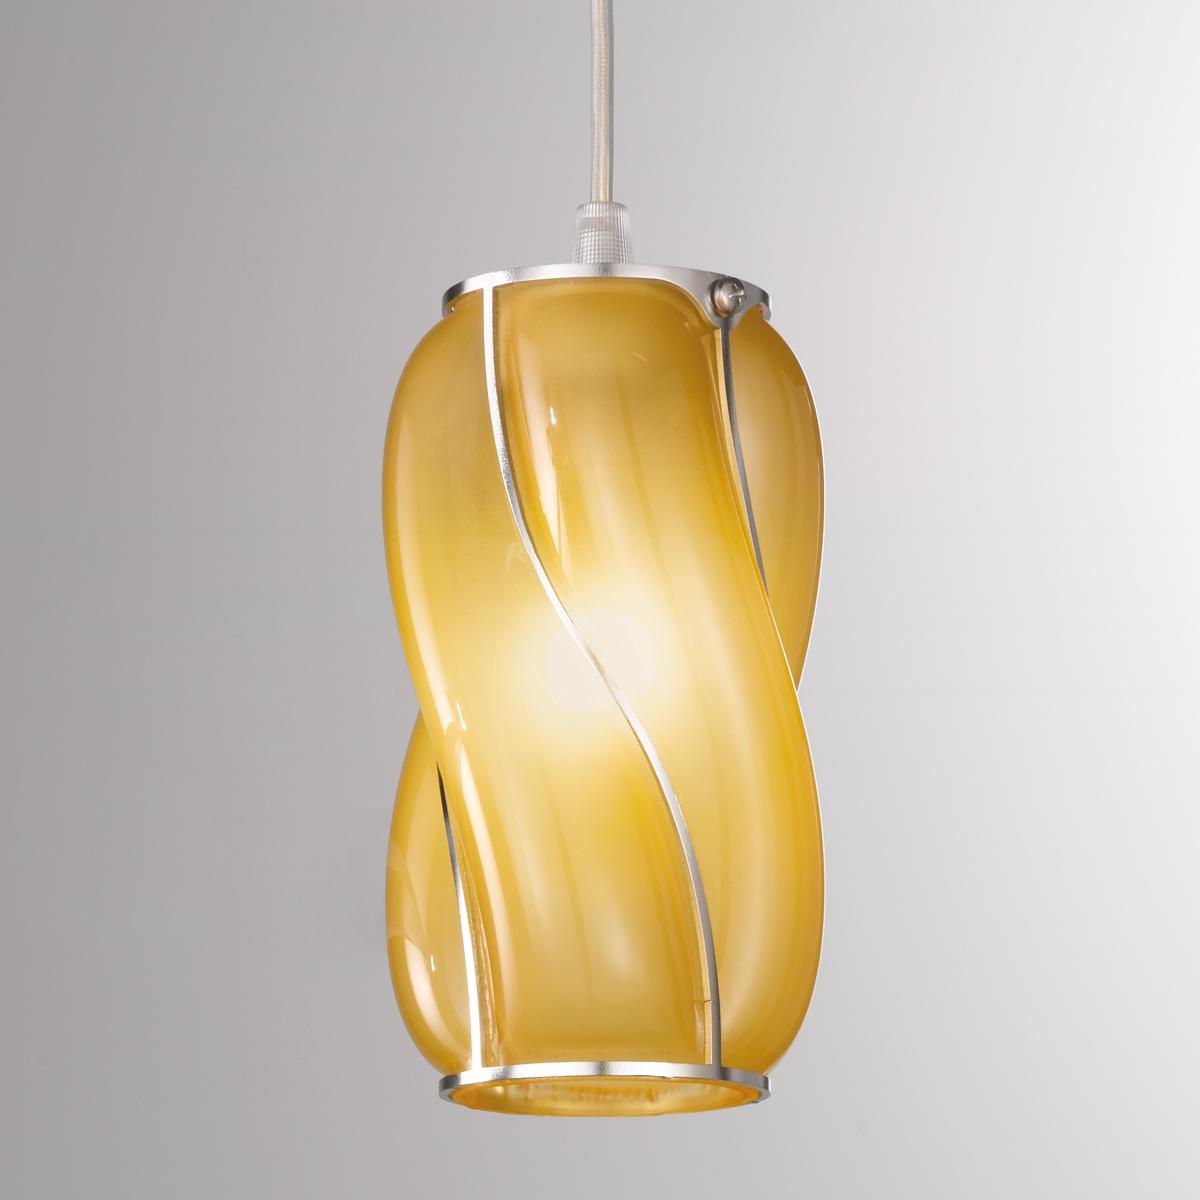 petite suspension r tro de forme cylindrique en verre souffl de murano. Black Bedroom Furniture Sets. Home Design Ideas